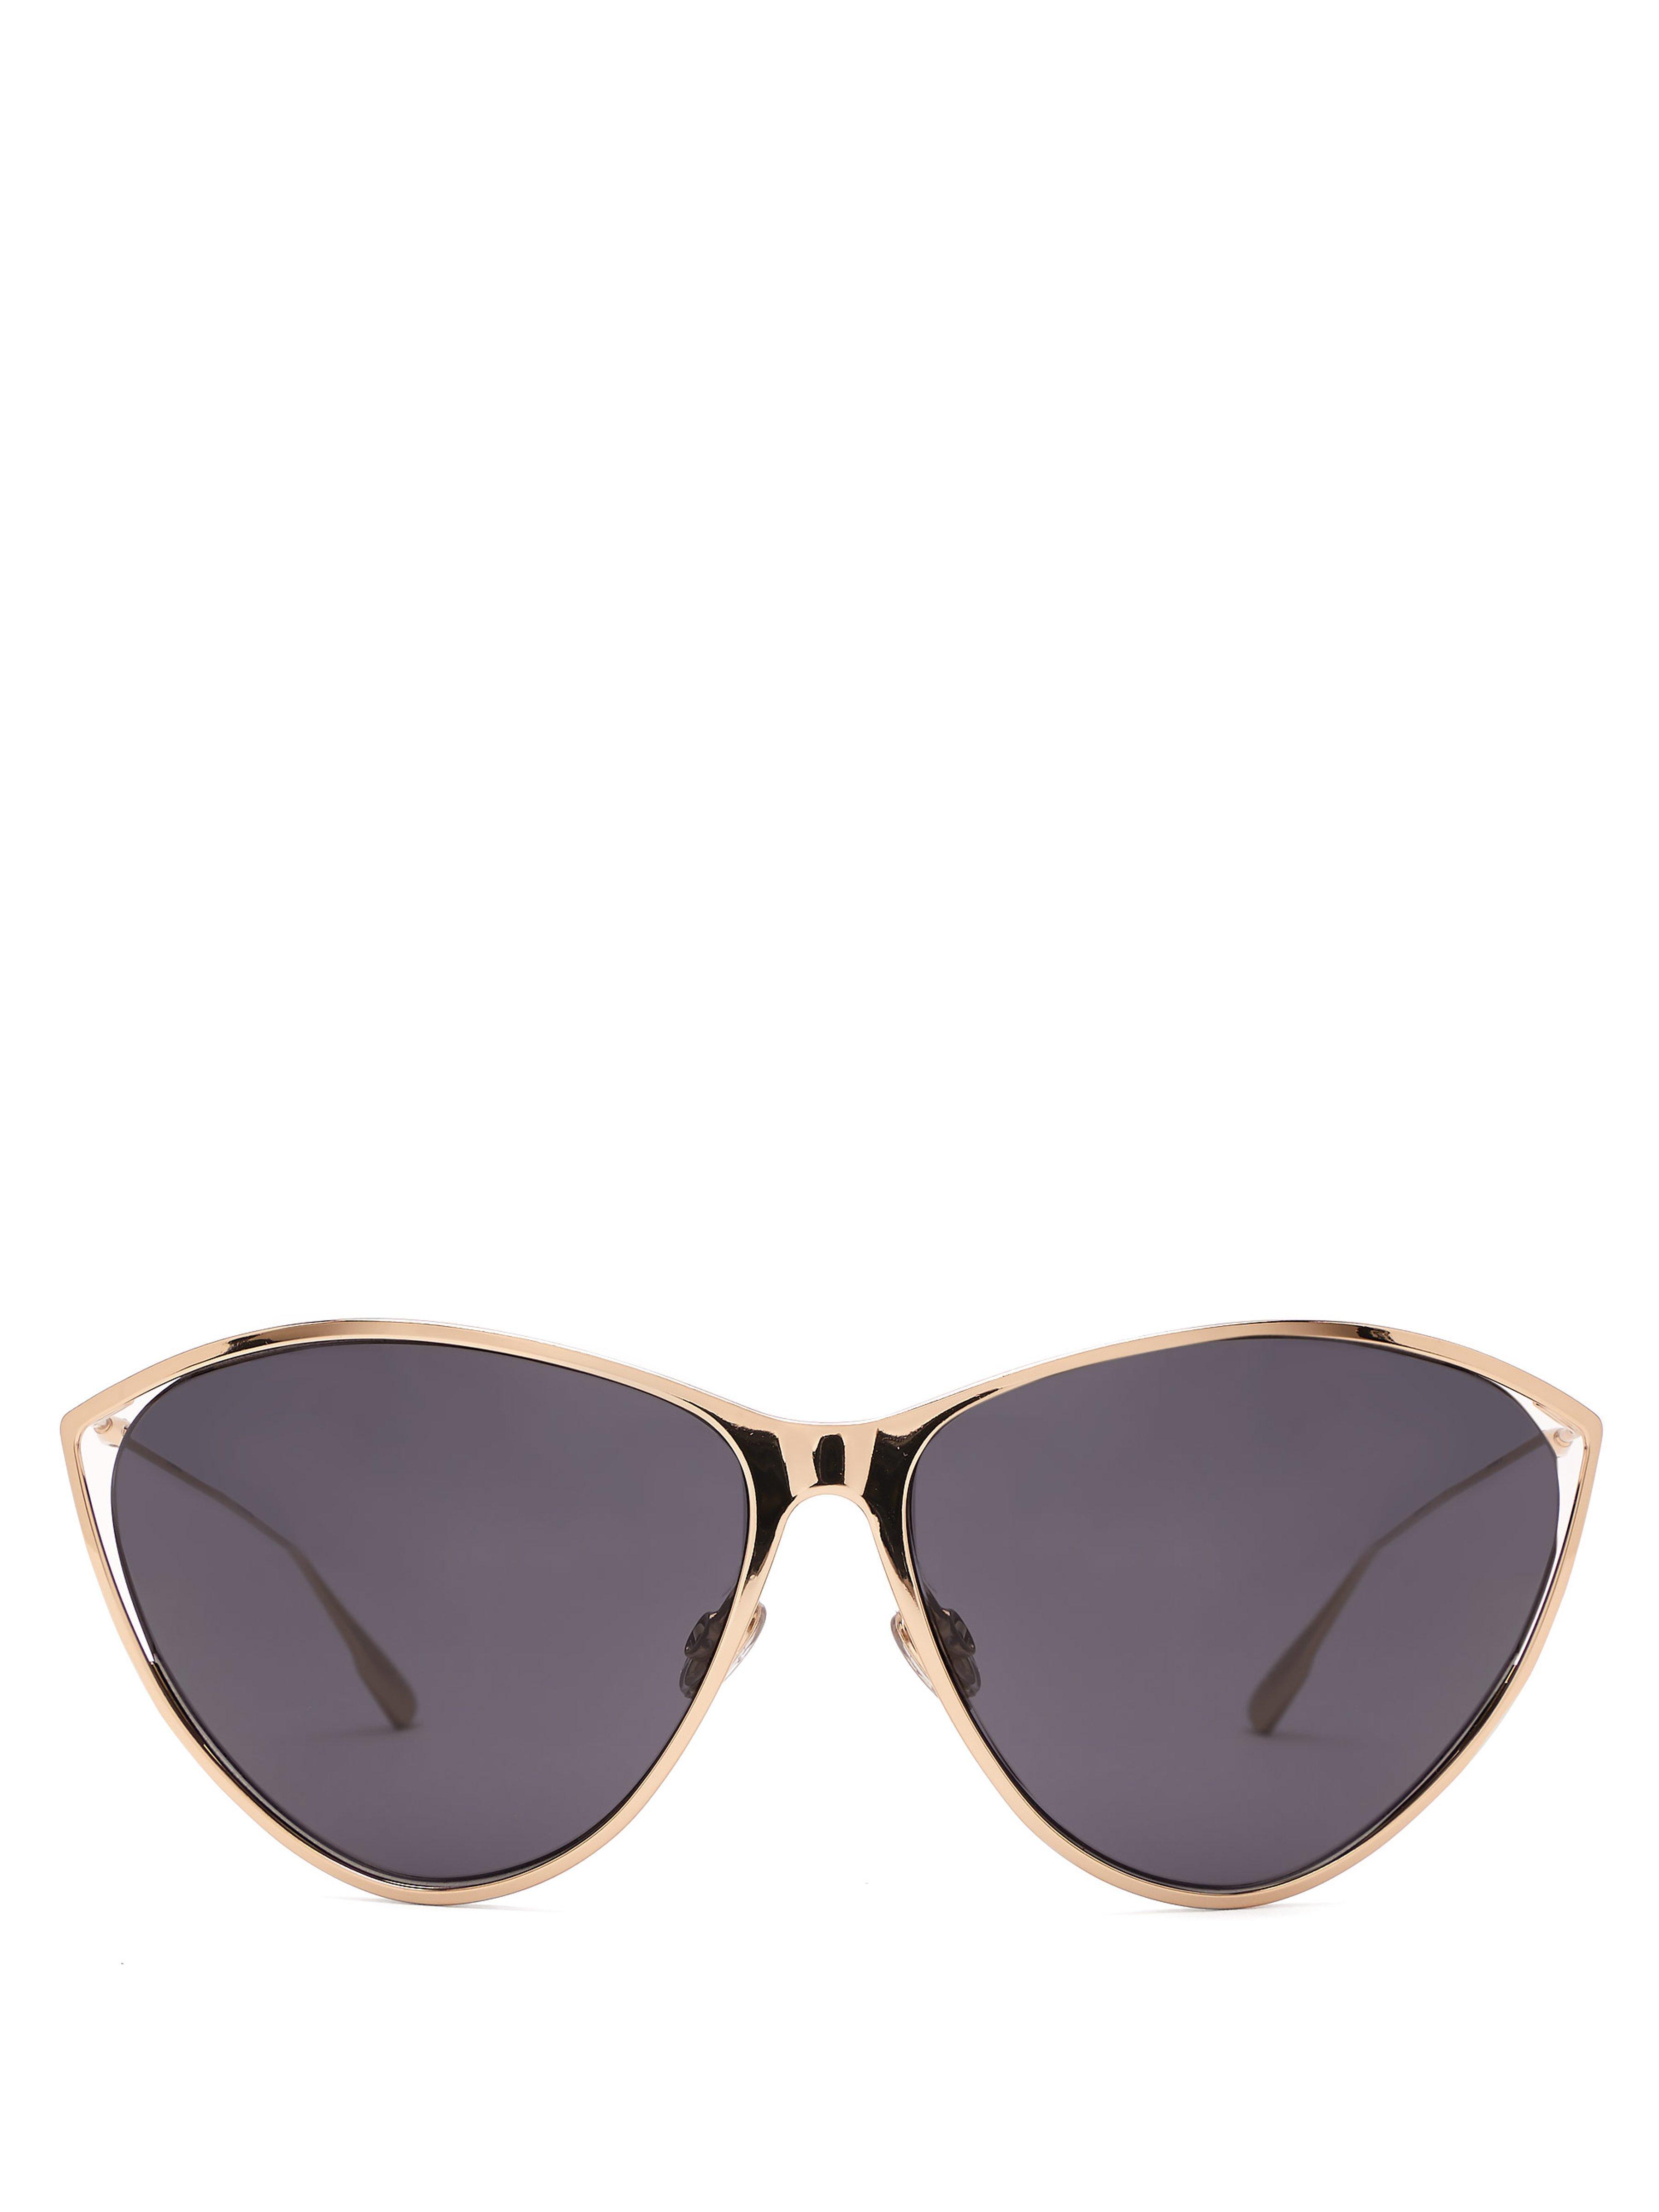 985d58b2e2f Dior. Women s Cat Eye Metal Sunglasses